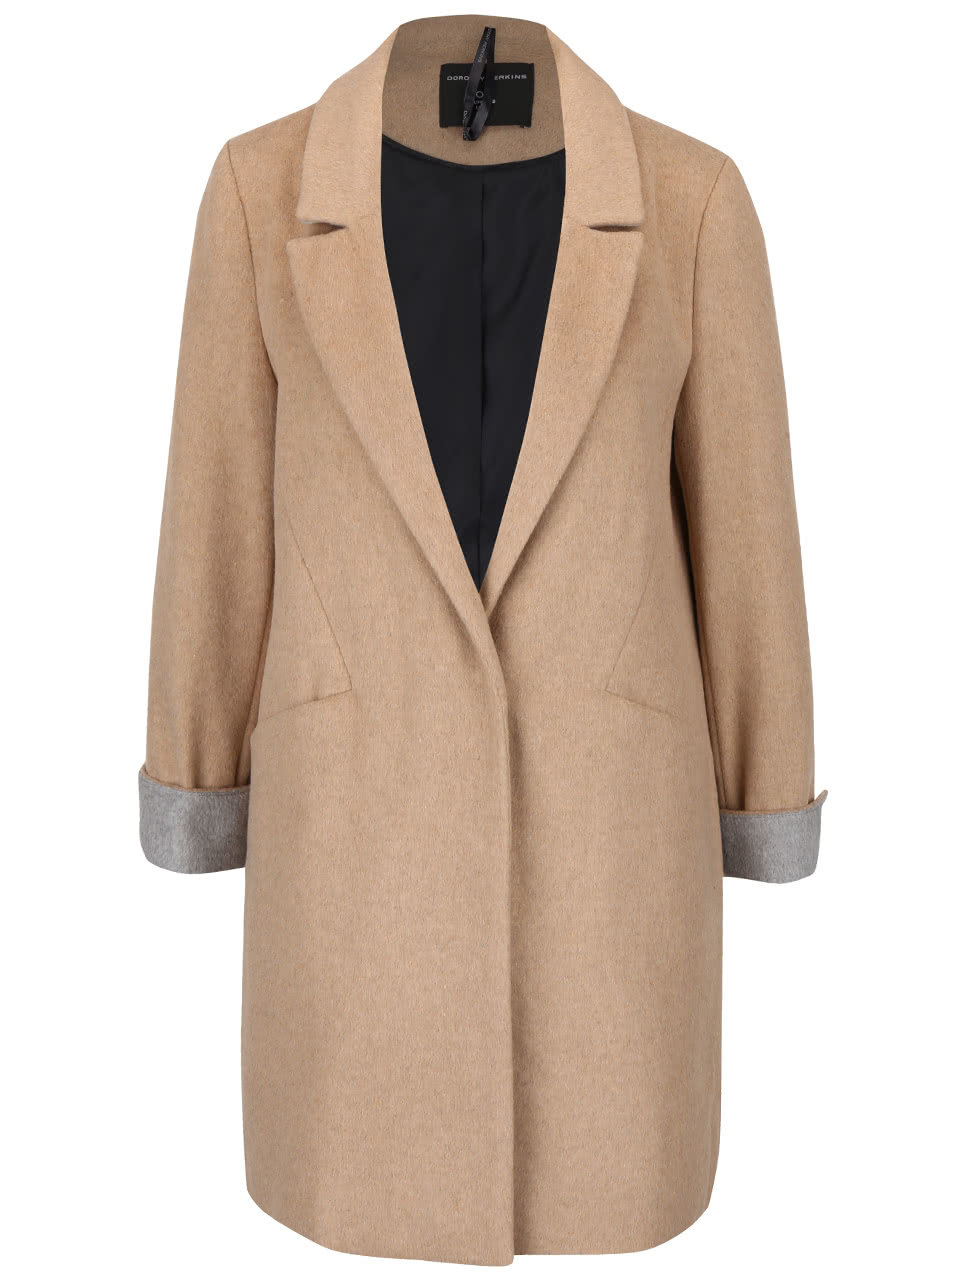 Svetlohnedý kabát s vreckami Dorothy Perkins ... 3d3bed0edcc